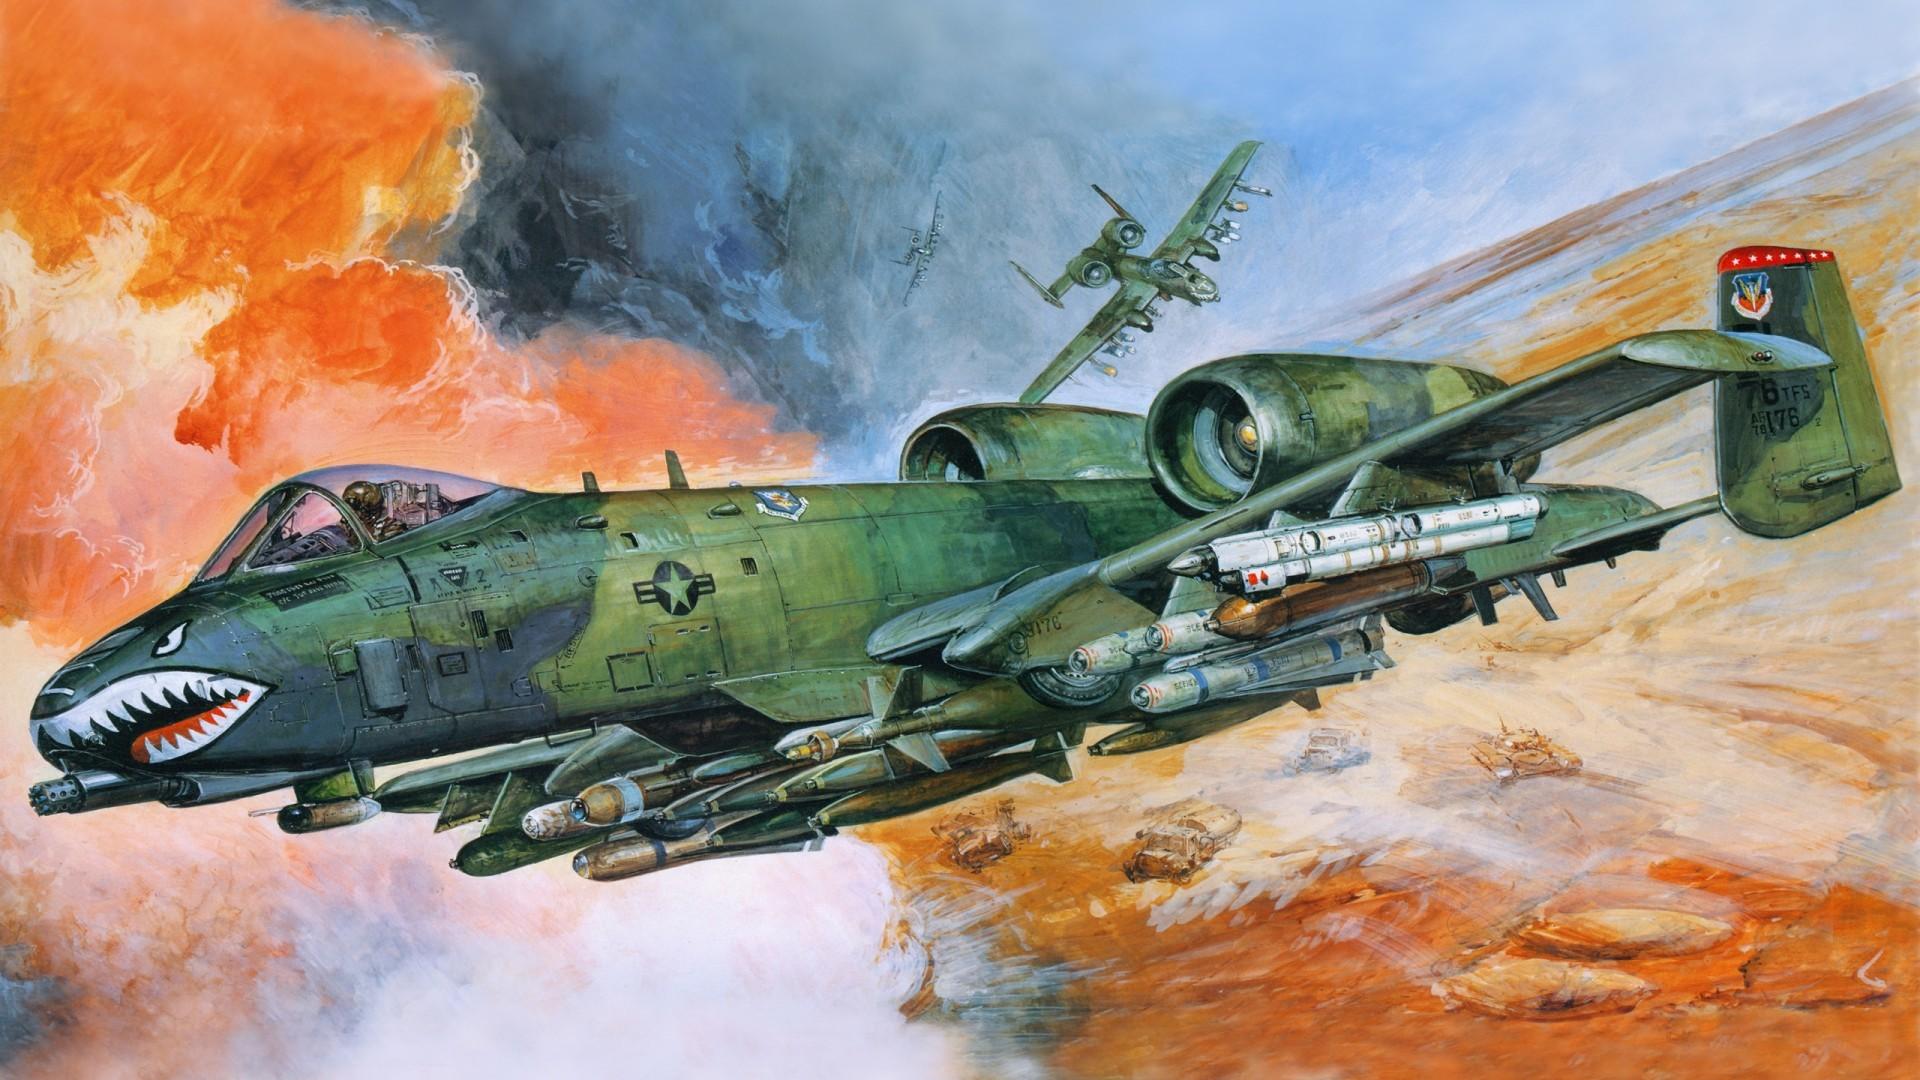 Airplane Painting Art Fighter Flight Aviation Wallpapers … Fairchild  Republic a 10 Thunderbolt …